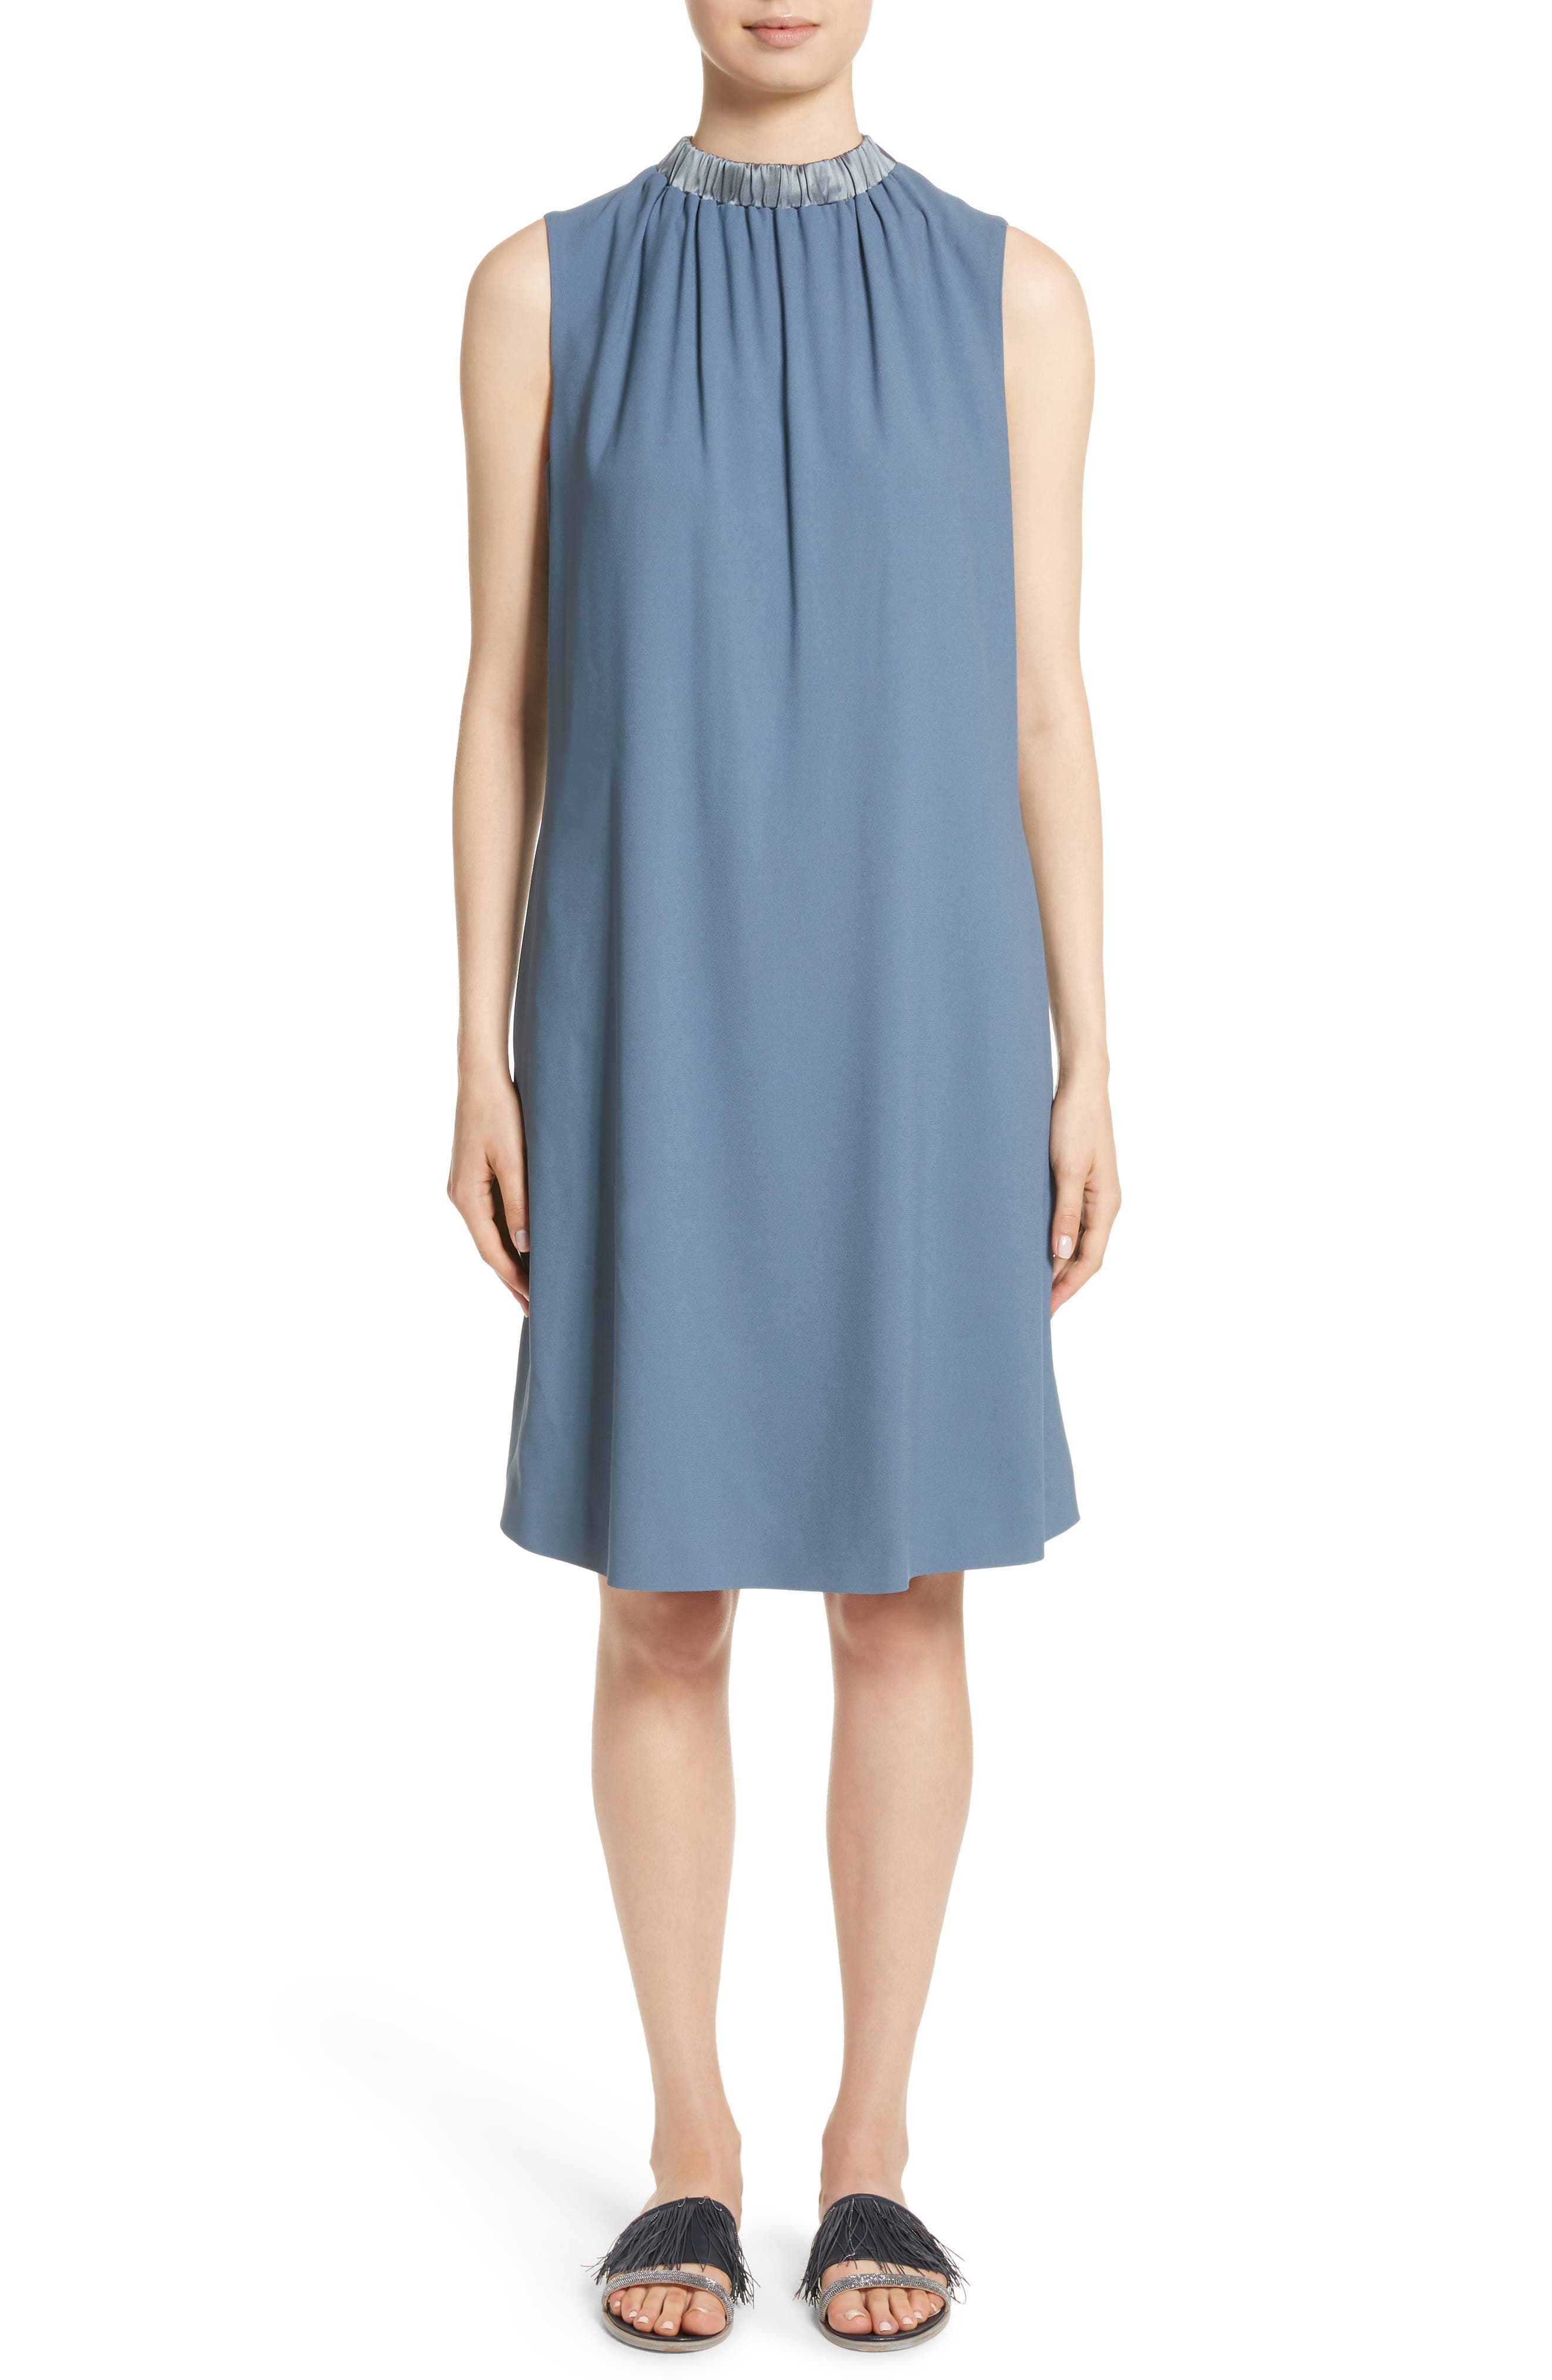 Alternate Image 1 Selected - Fabiana Filippi Satin Trim Crepe Dress